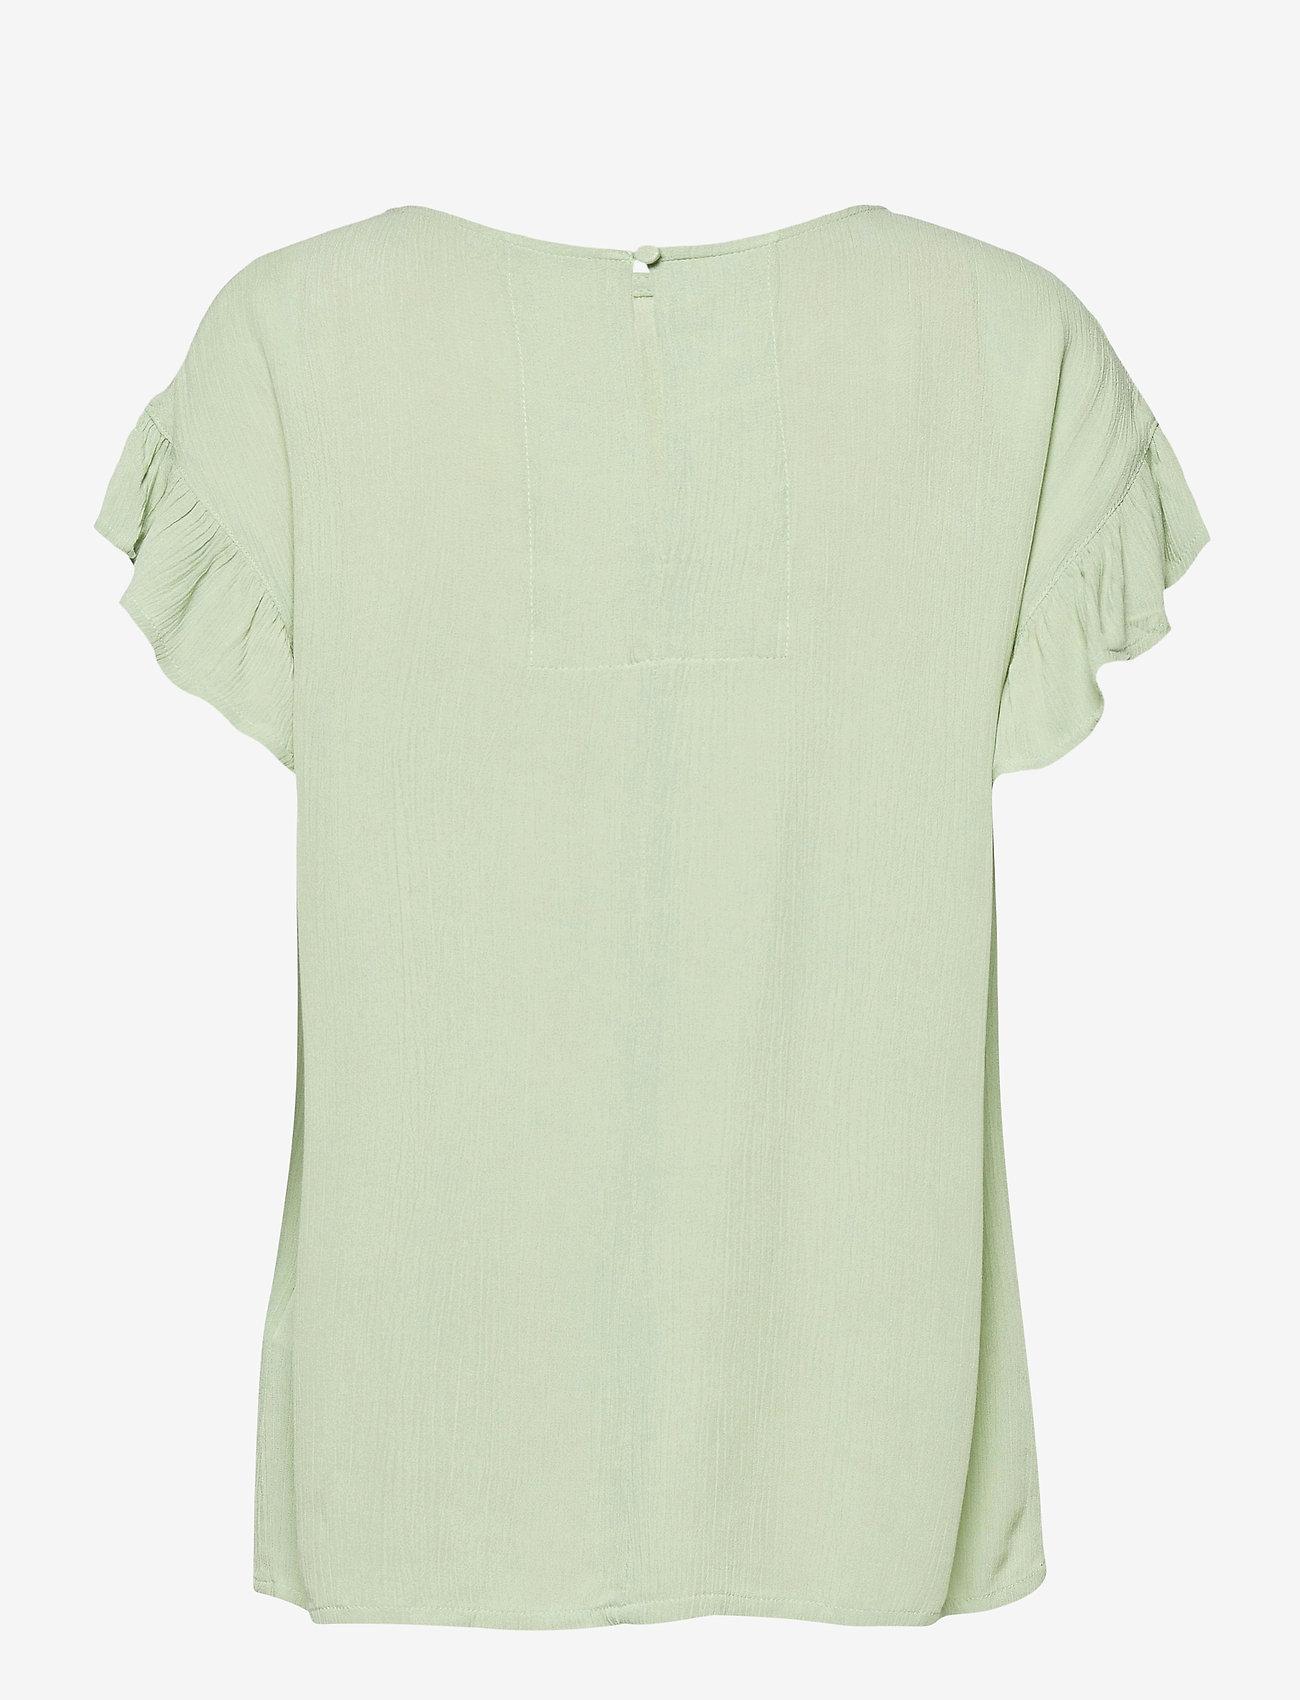 ICHI - IHMARRAKECH SO SS4 - short-sleeved blouses - swamp - 1